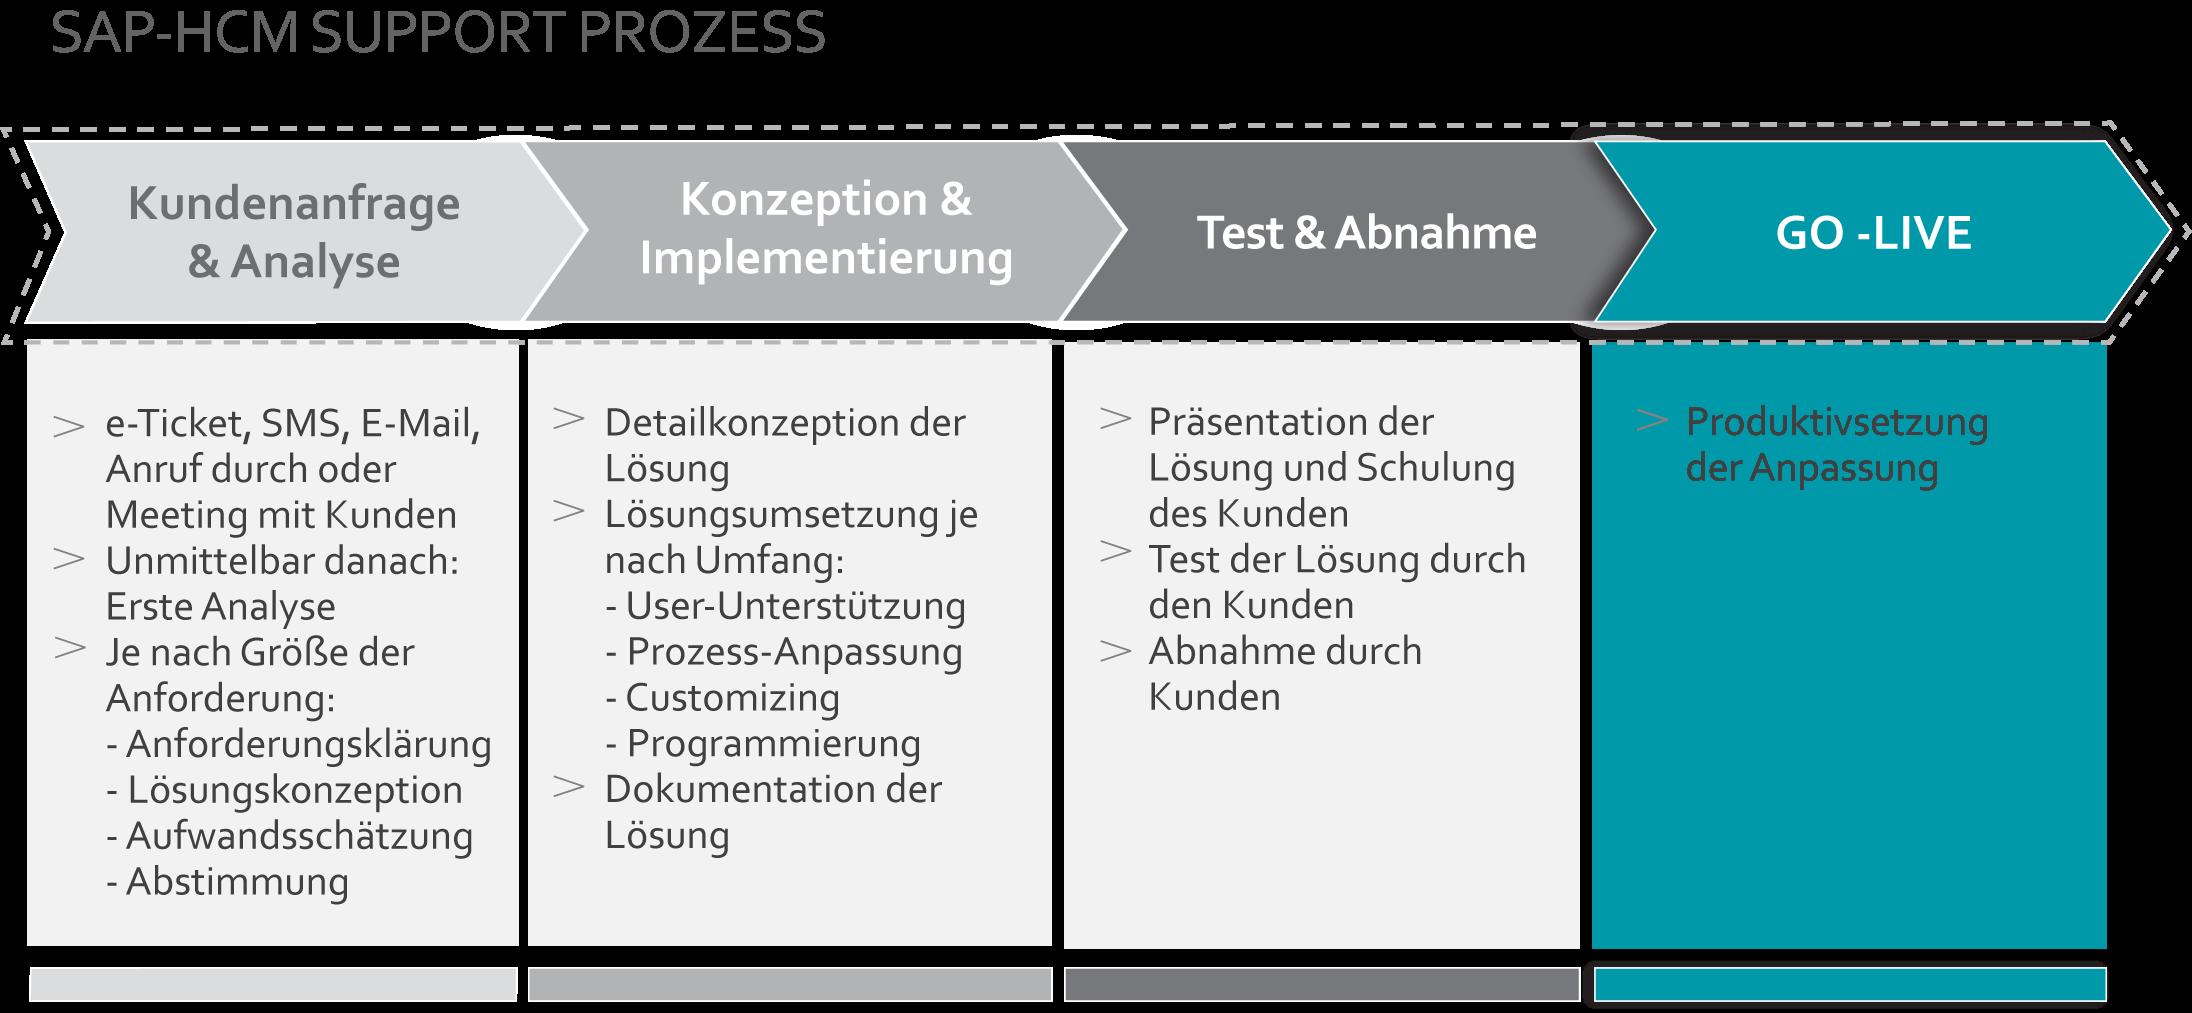 schaubild_supportprozess_webiste_de